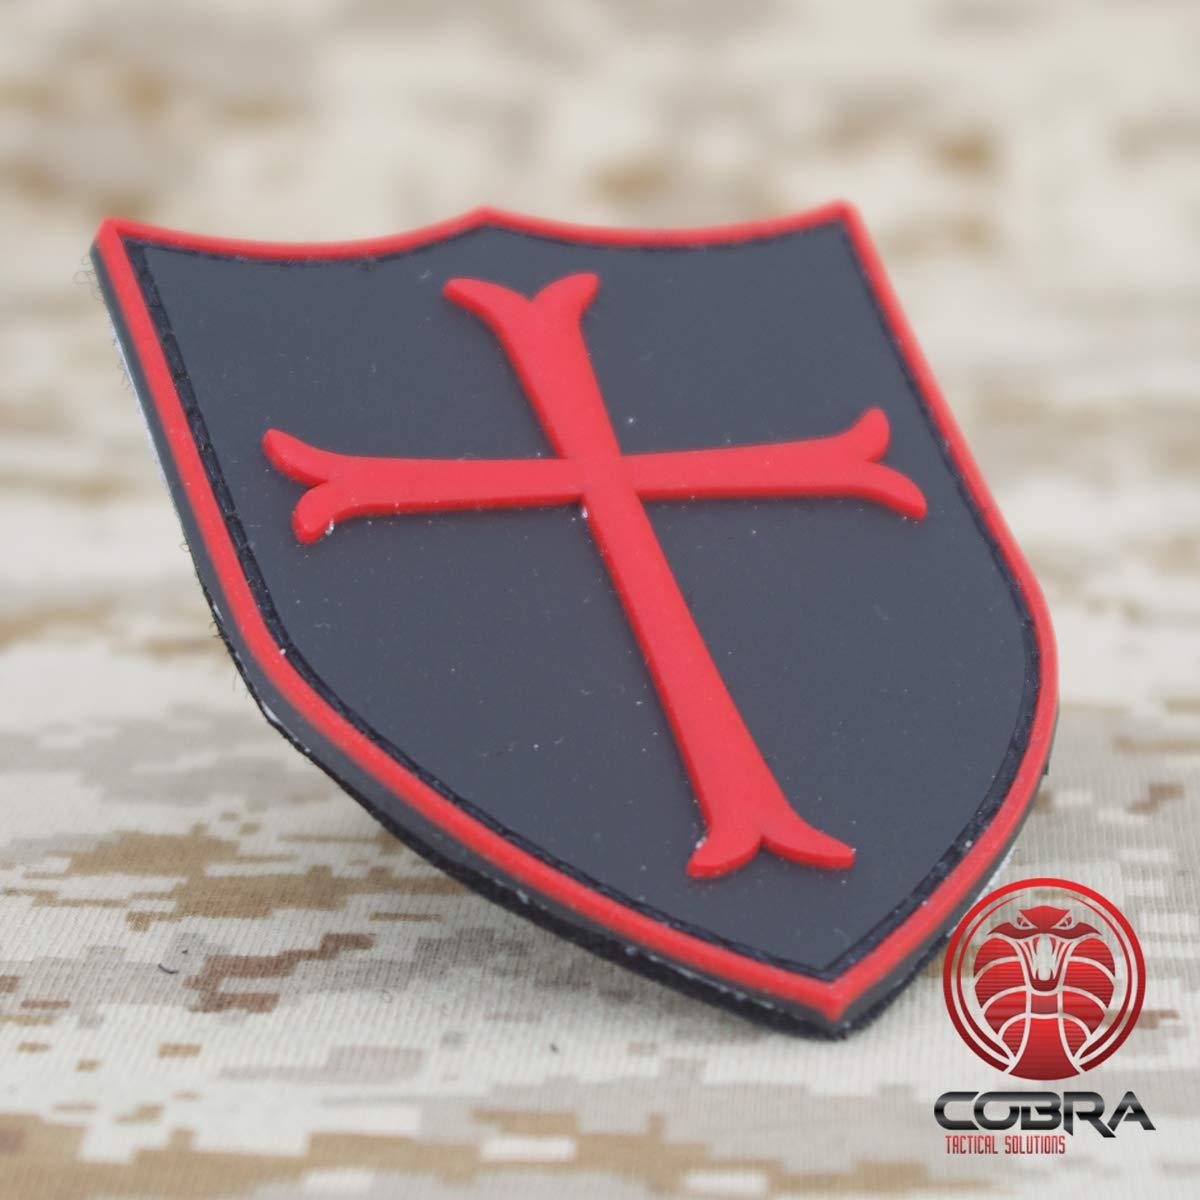 Cobra Tactical Solutions Military PVC Patch Crusader Cross//Kreuzritter Kreuz Black mit Klettverschluss f/ür Airsoft//Paintball f/ür Taktische Kleidung//Rucksack